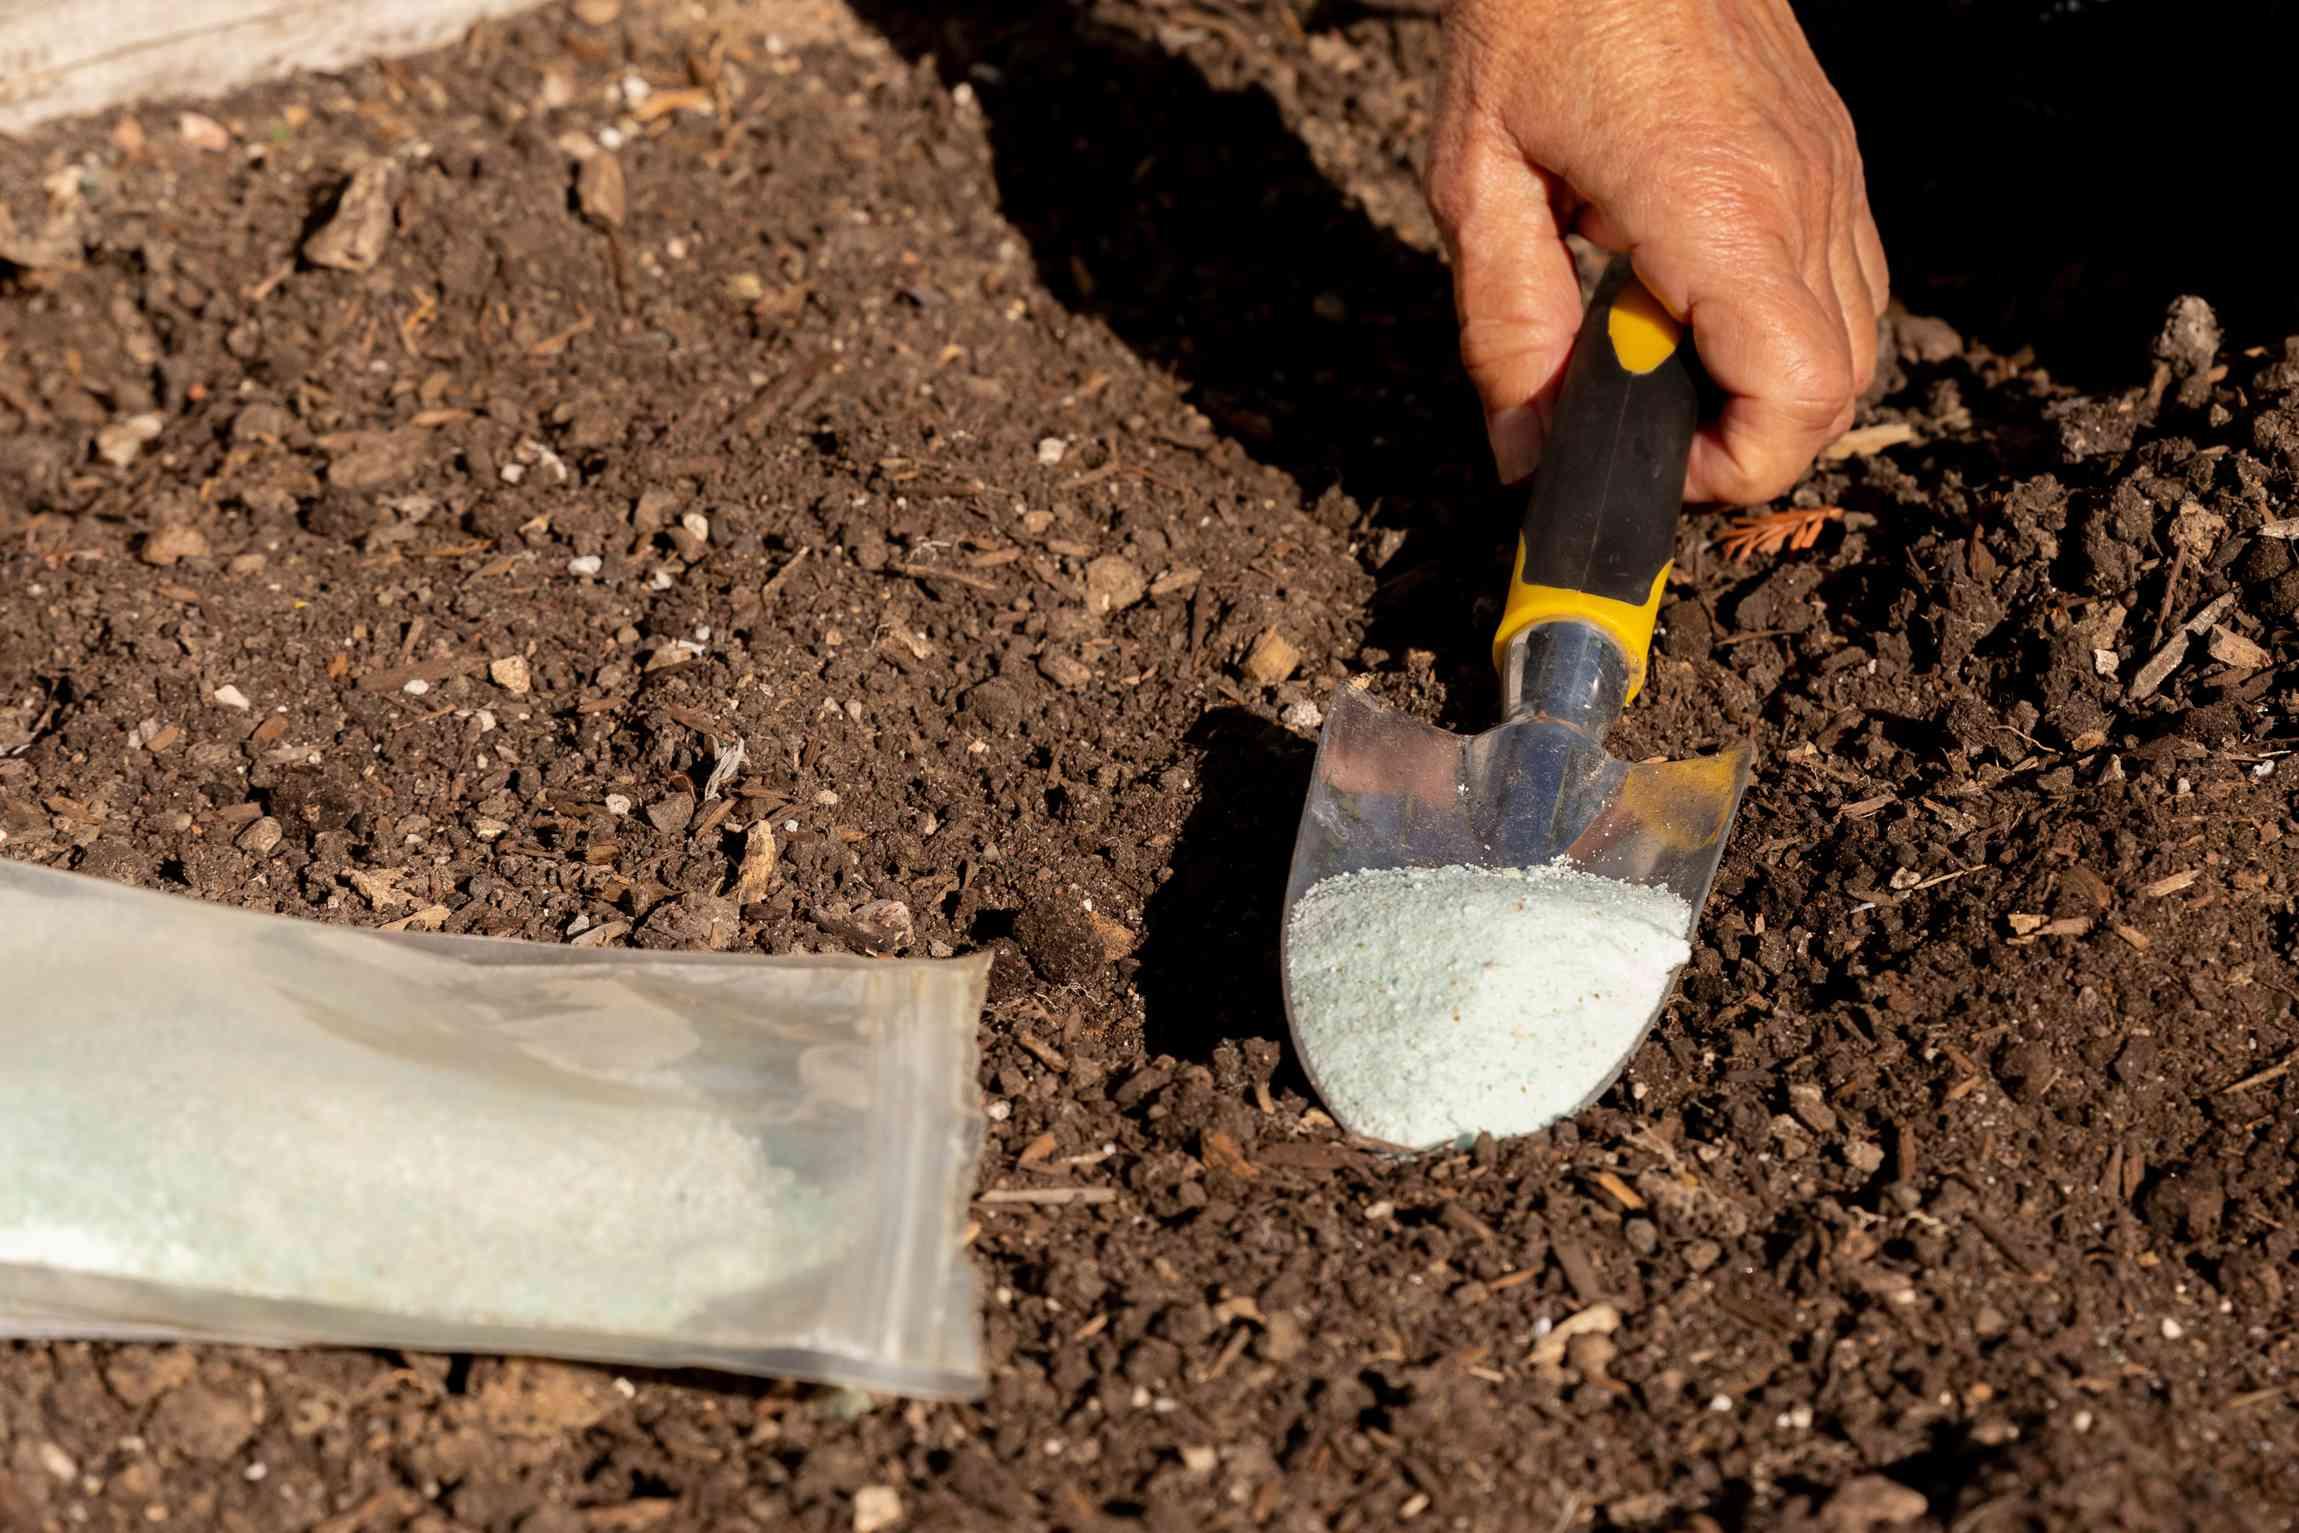 Sulfur on hand-held shovel added to soil for more acidity